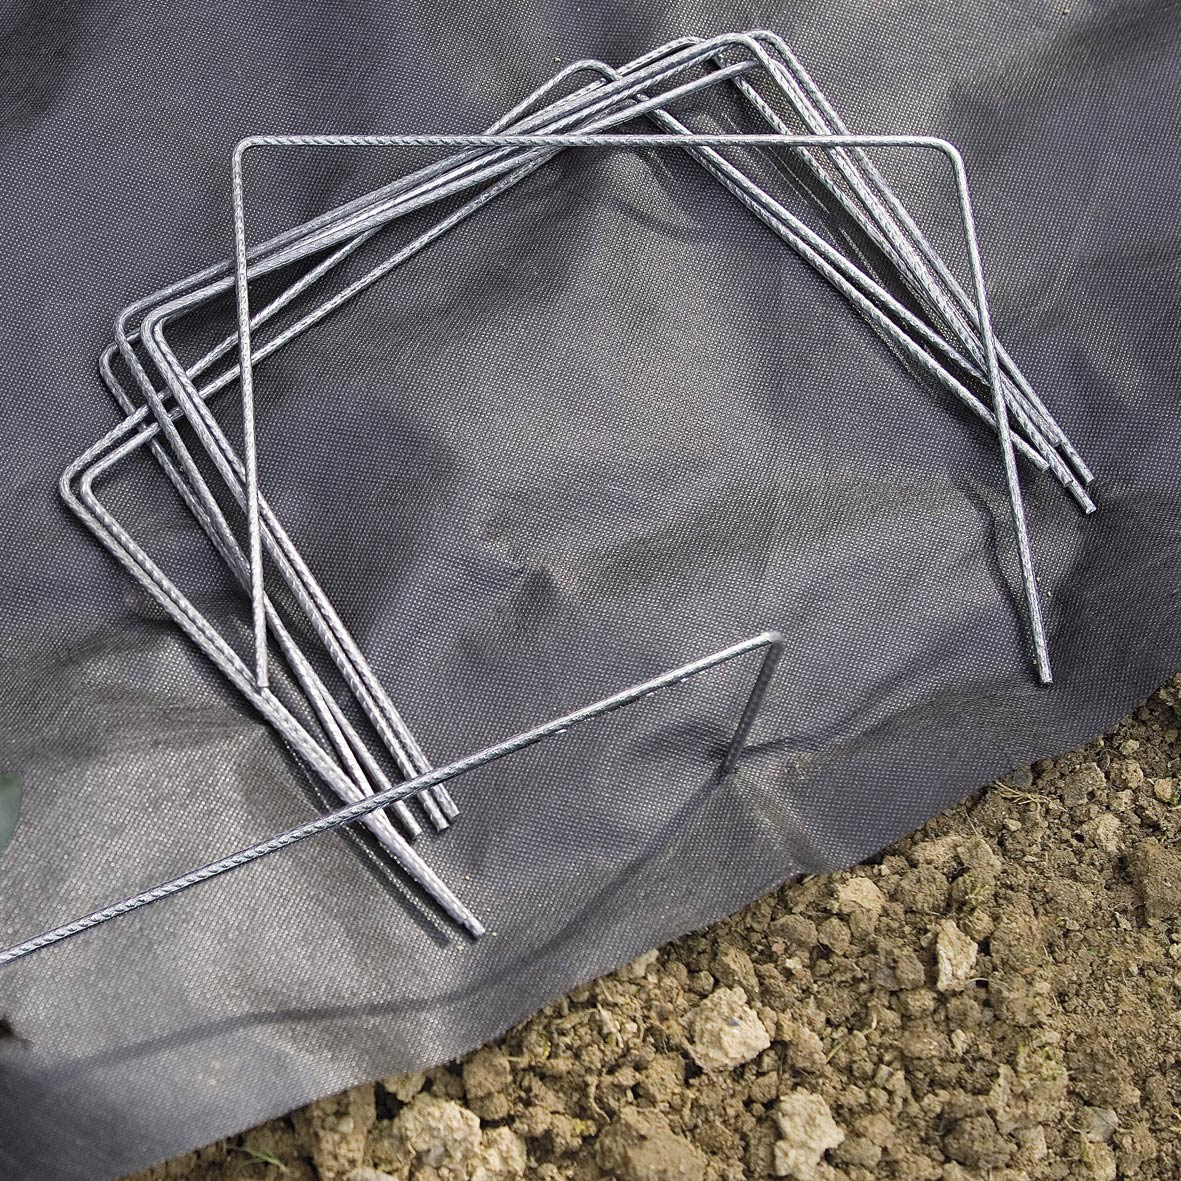 100 agrafes m talliques fixation des toiles nortene leroy merlin. Black Bedroom Furniture Sets. Home Design Ideas